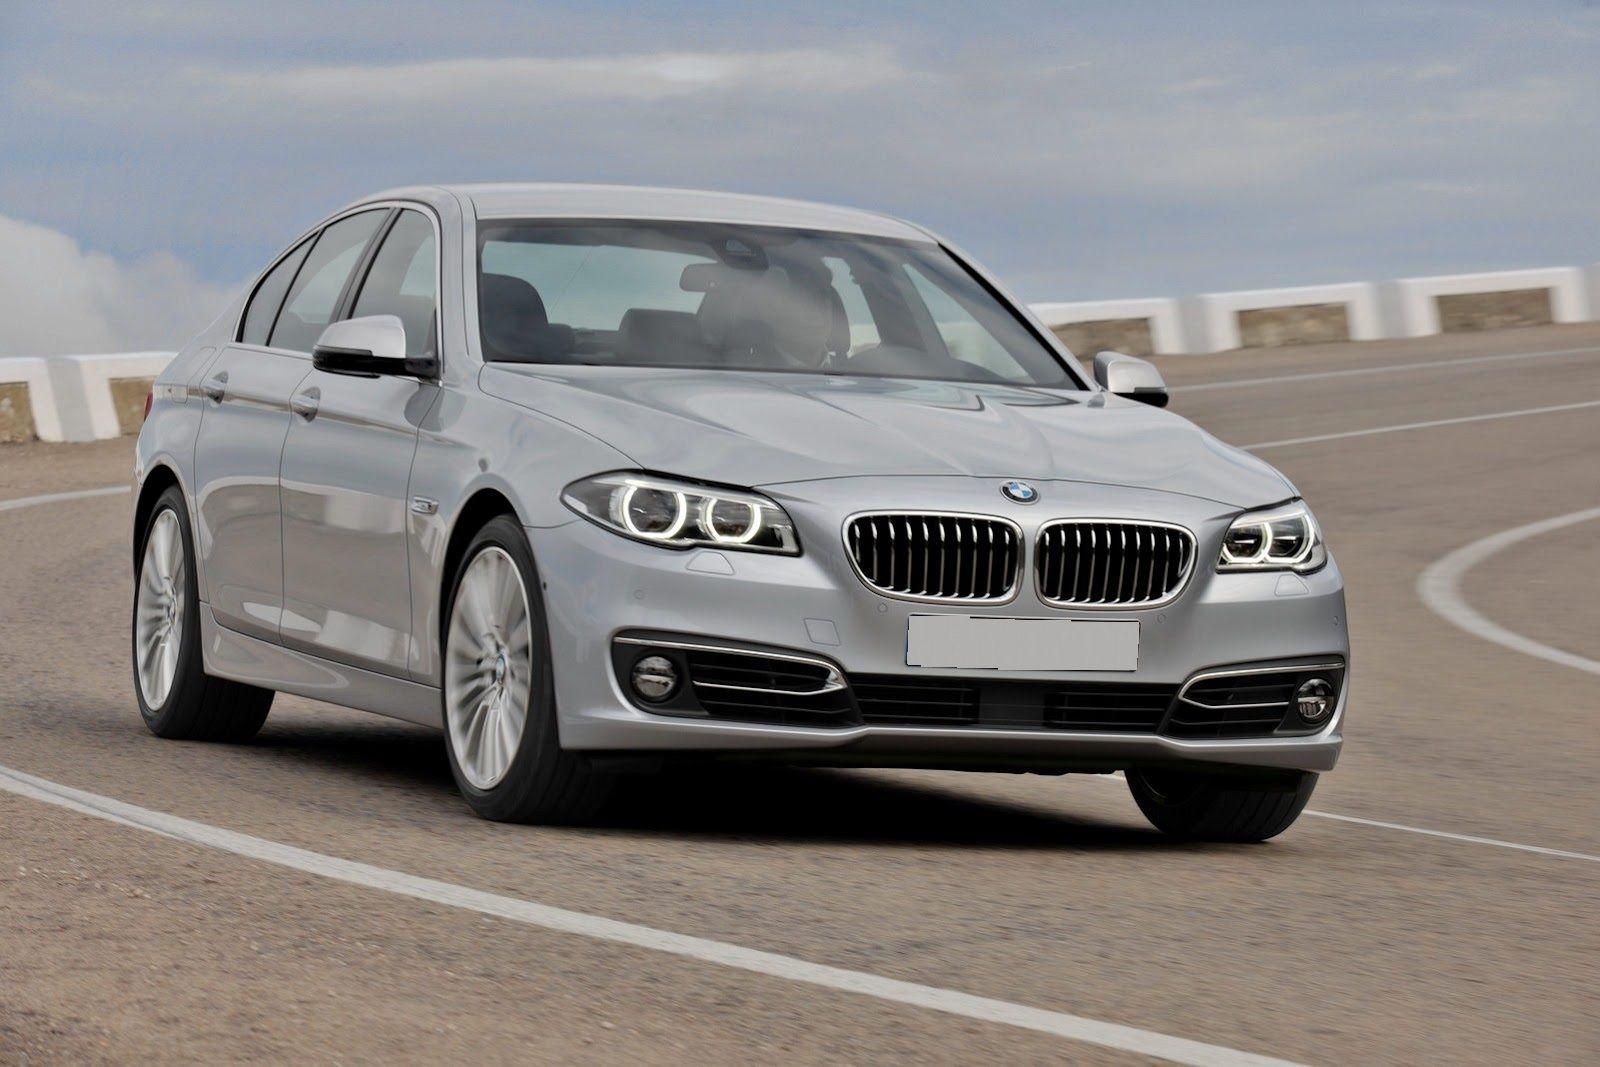 Rent luxury bmw 5 series in dubai http mkrentacar com cars